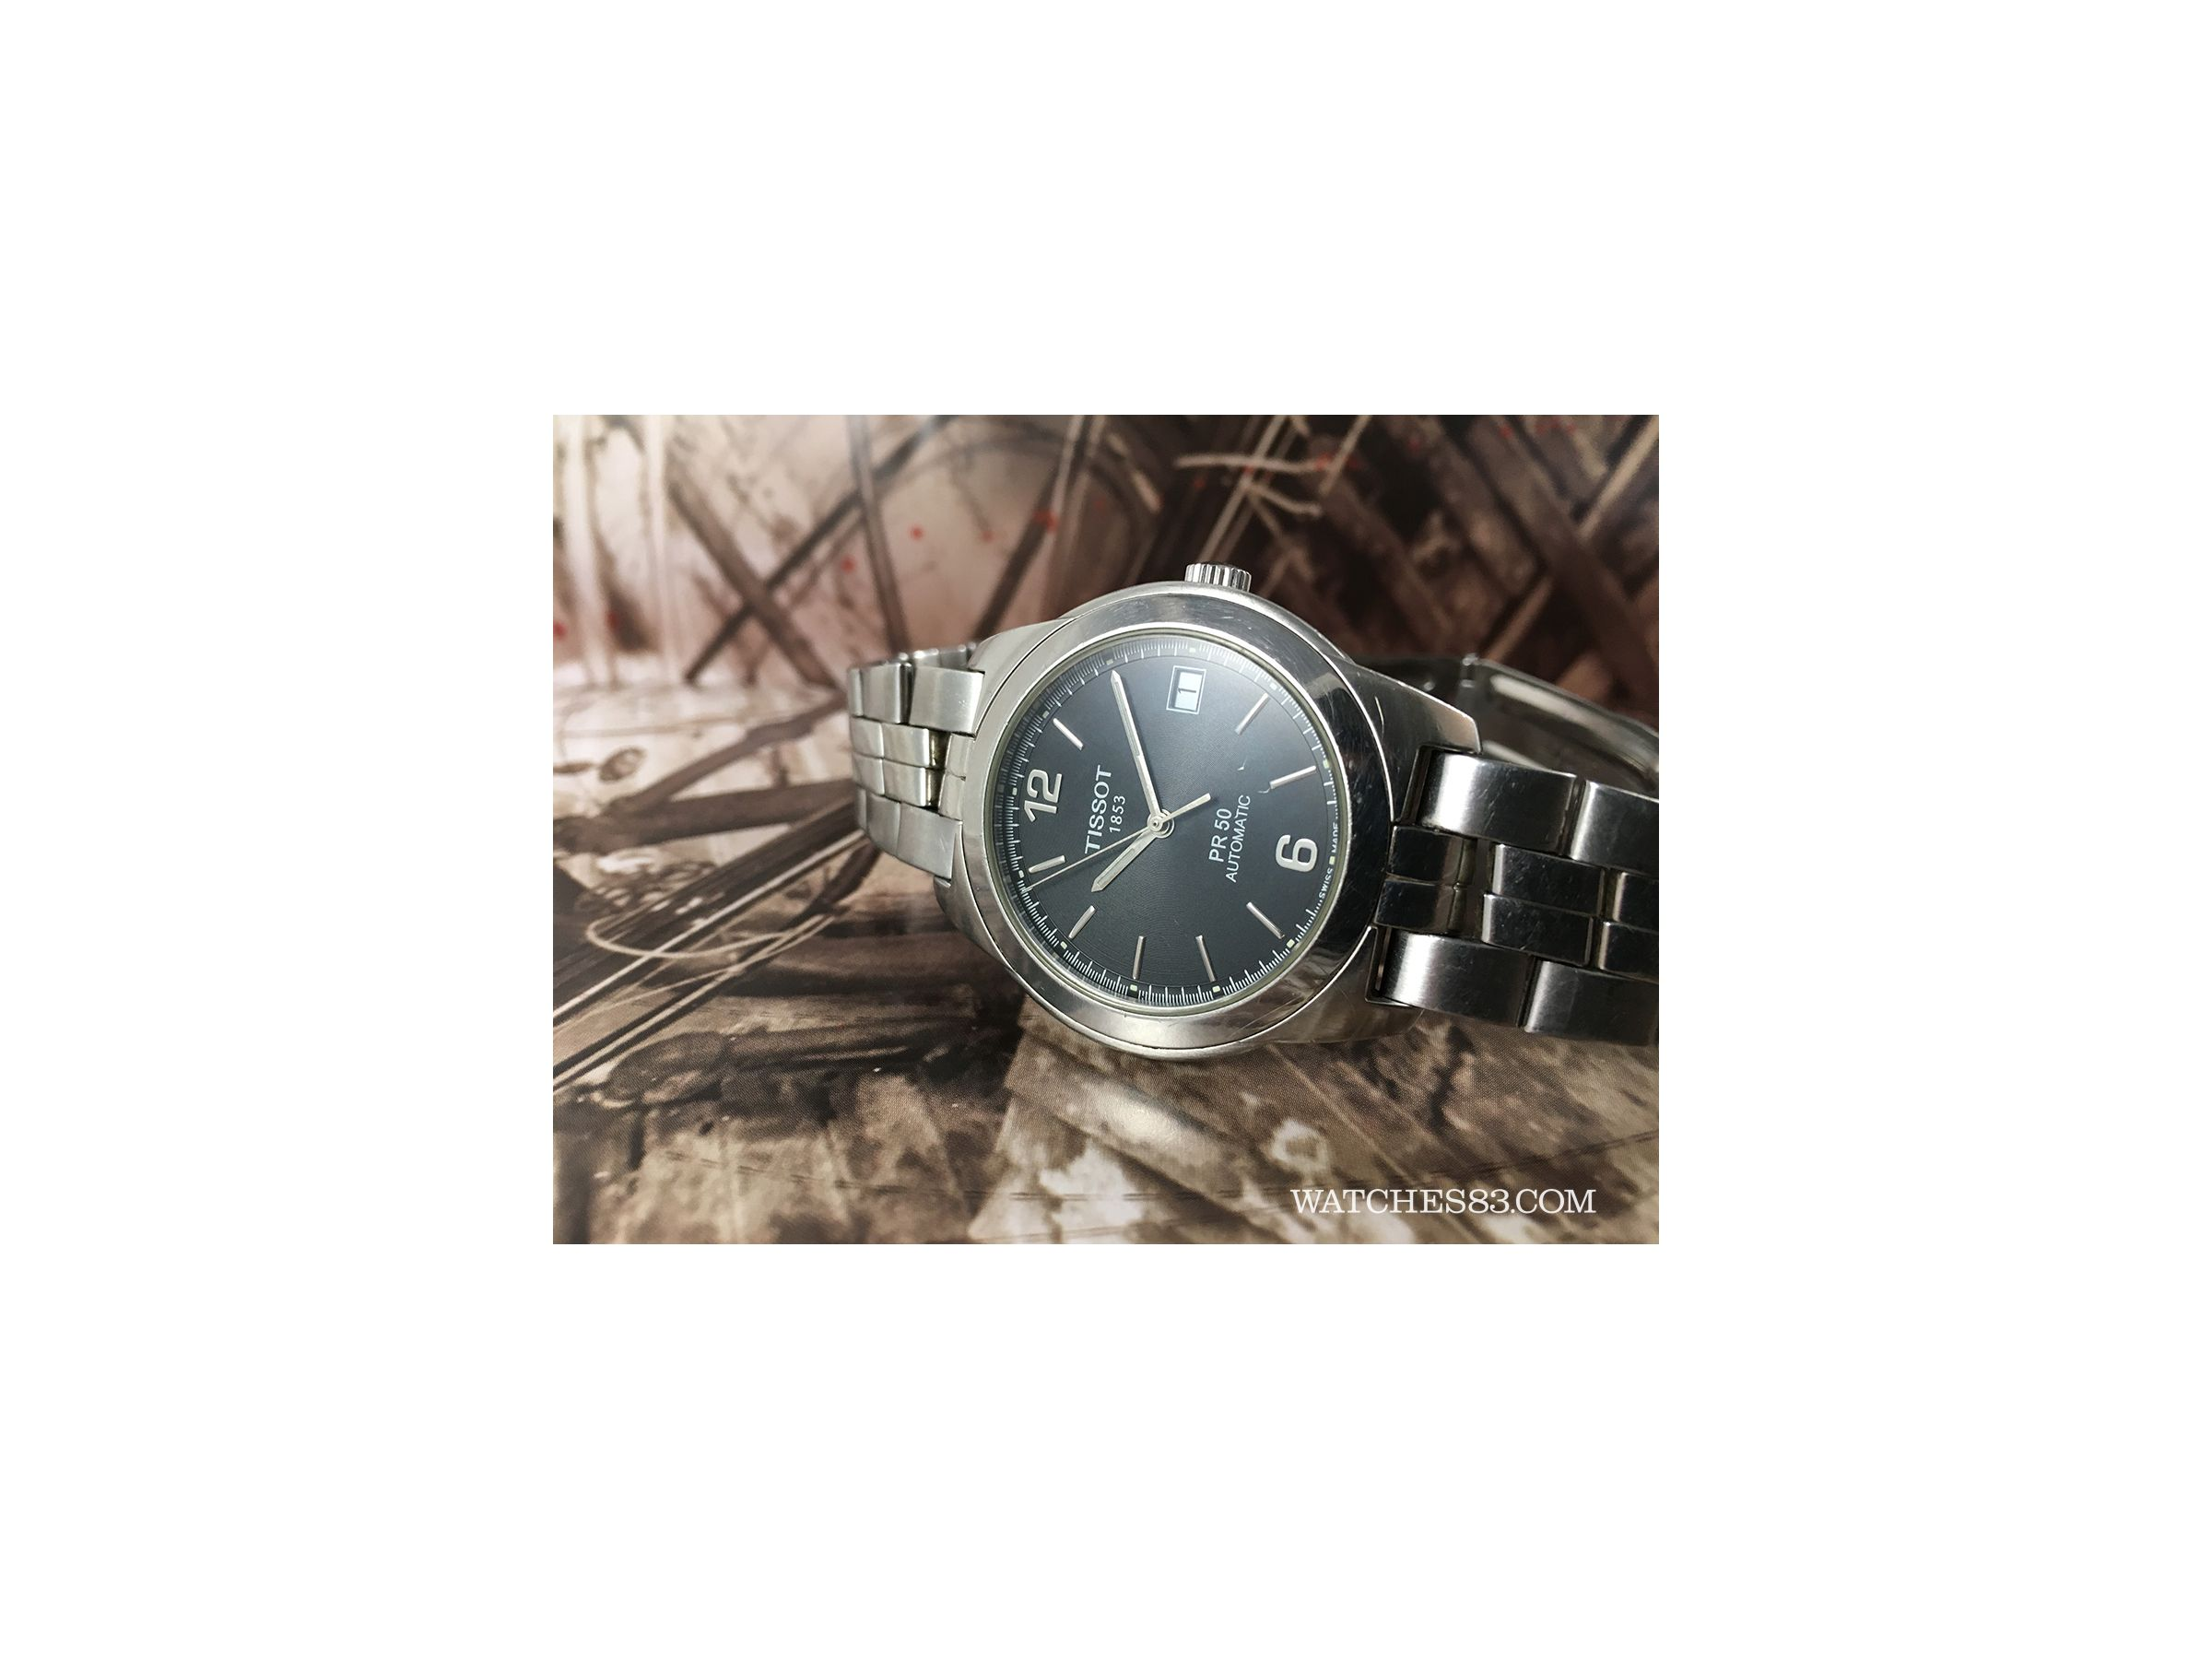 Black Swiss Watch Automatic Tissot 1853 Automatic PR50 Watches83